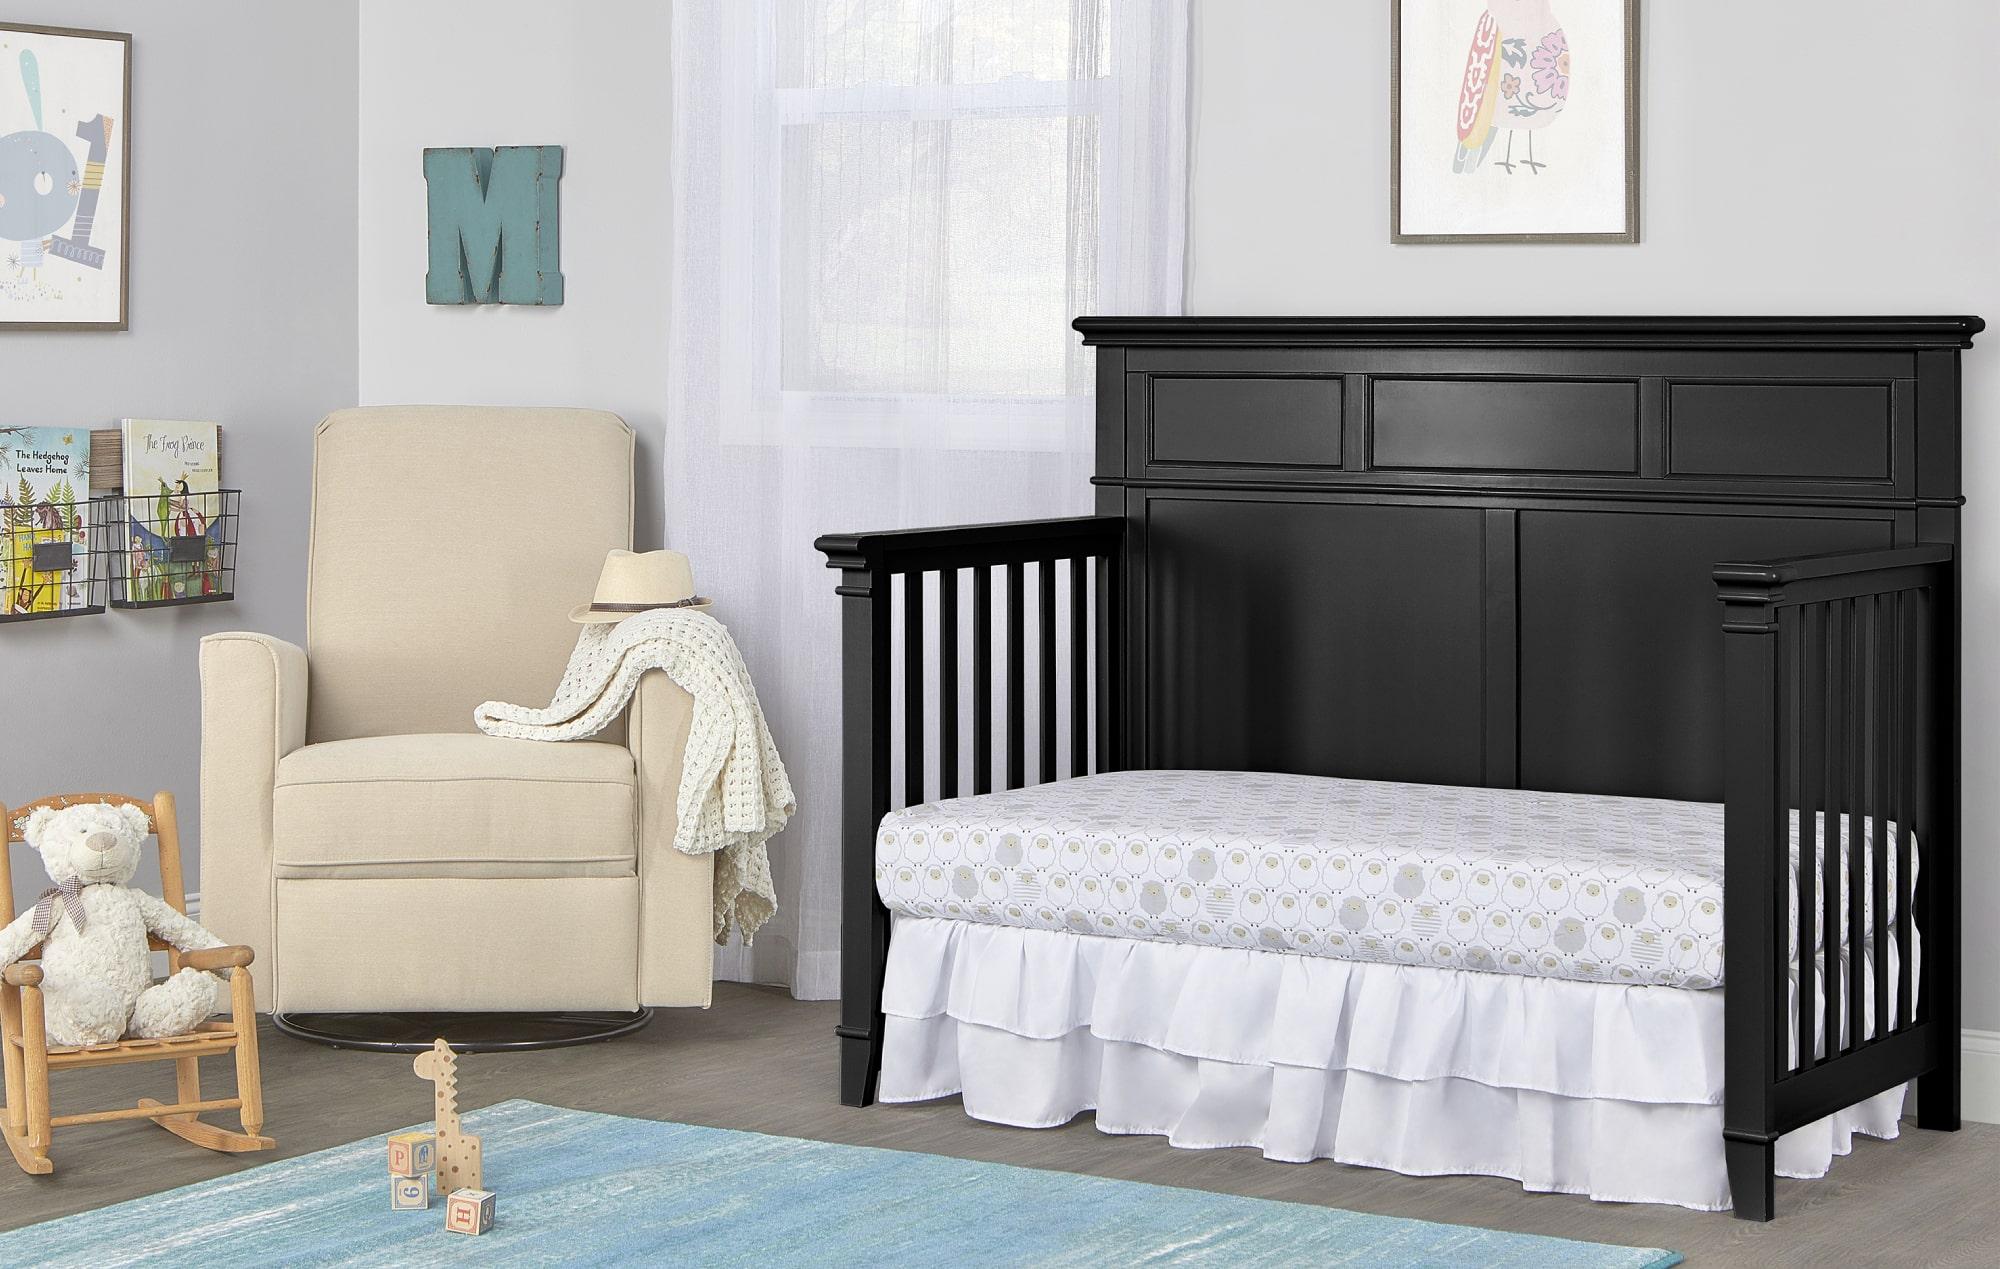 776-BLK Dover Day Bed Room Shot